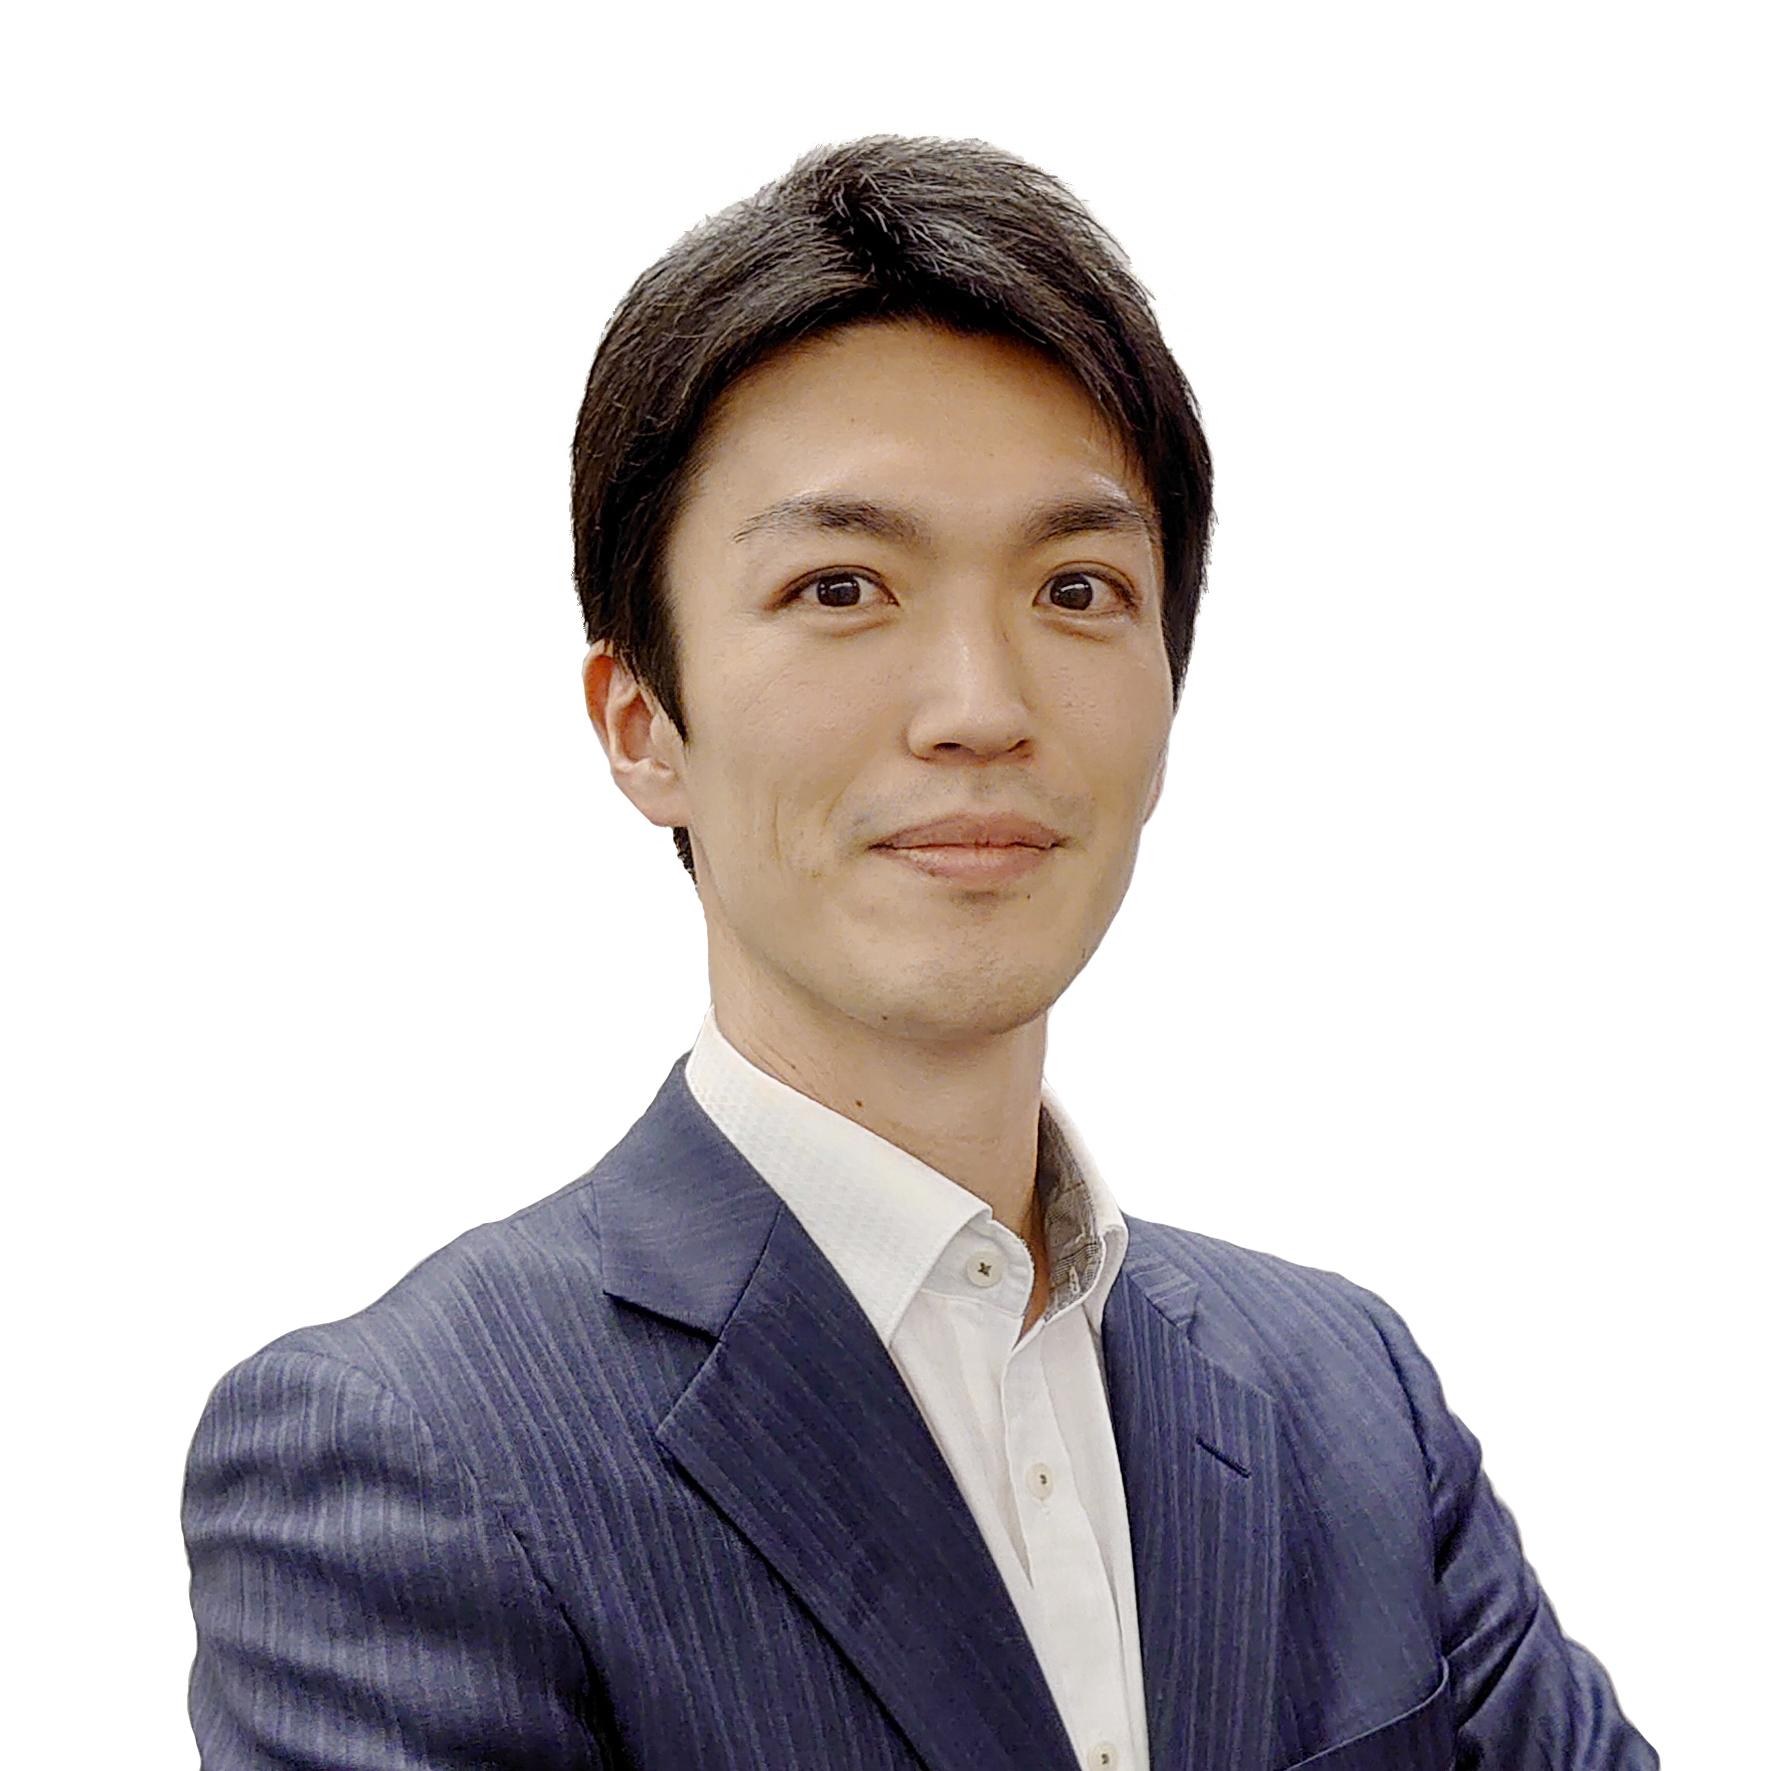 ASIMOV ROBOTICS株式会社 CTO 斎藤和也